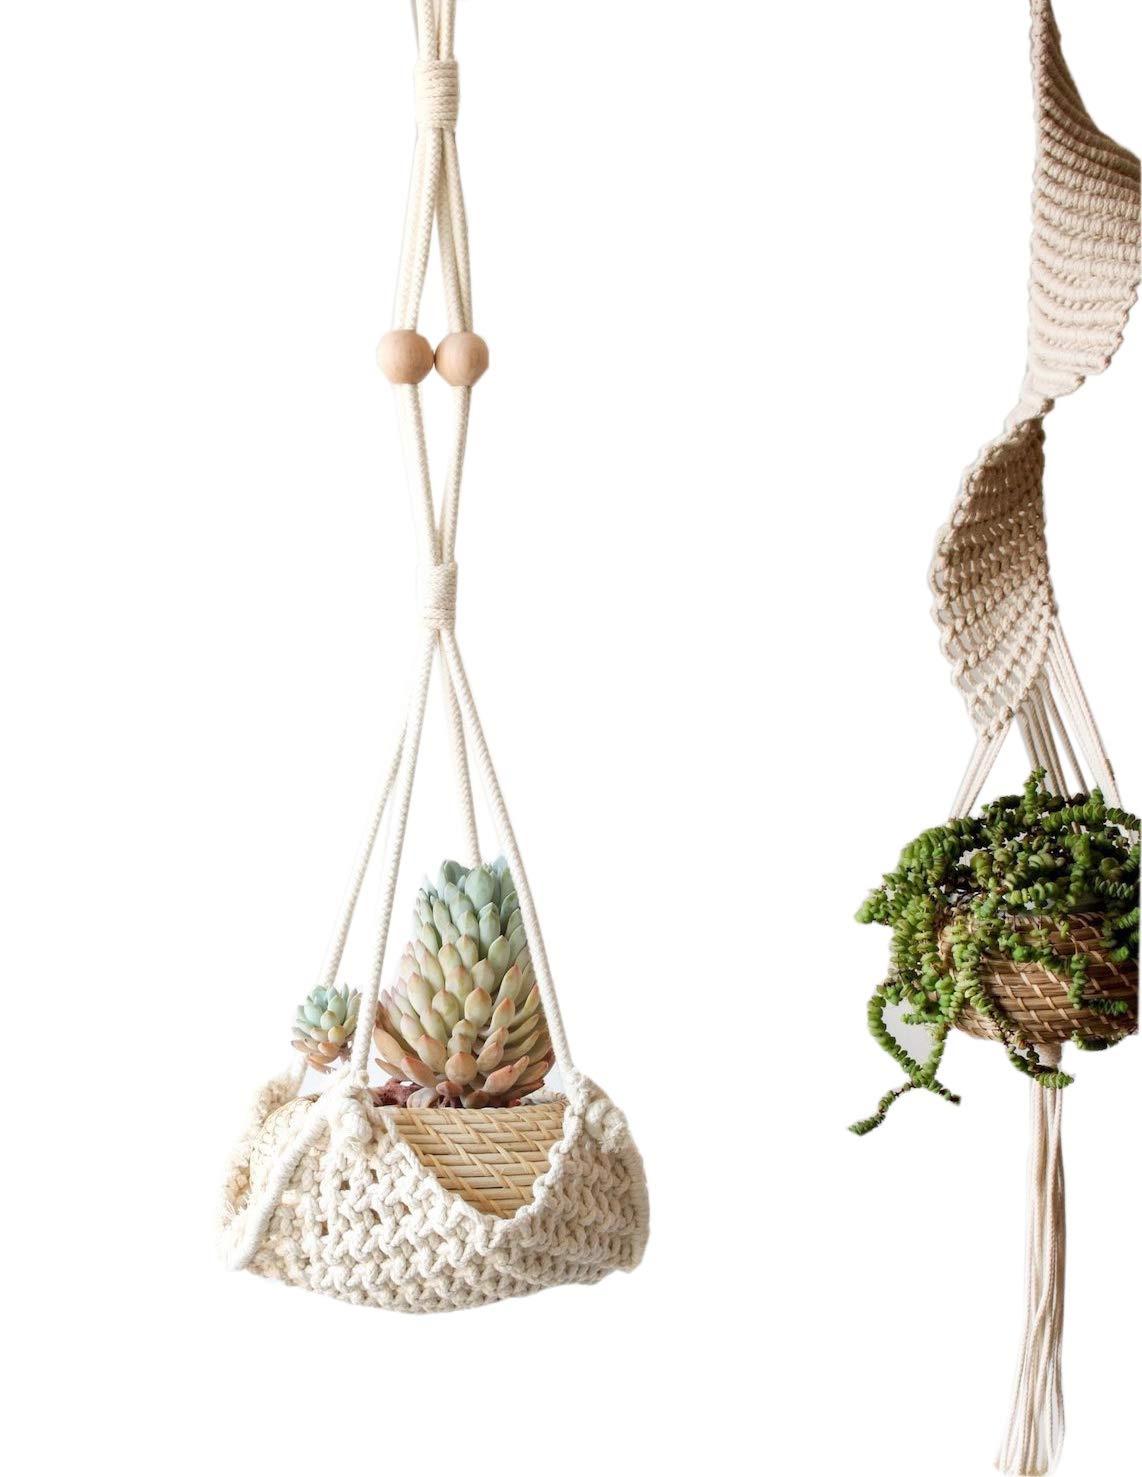 Macrame Hanging Planter Home Décor Cotton Rope Handwoven,37''L